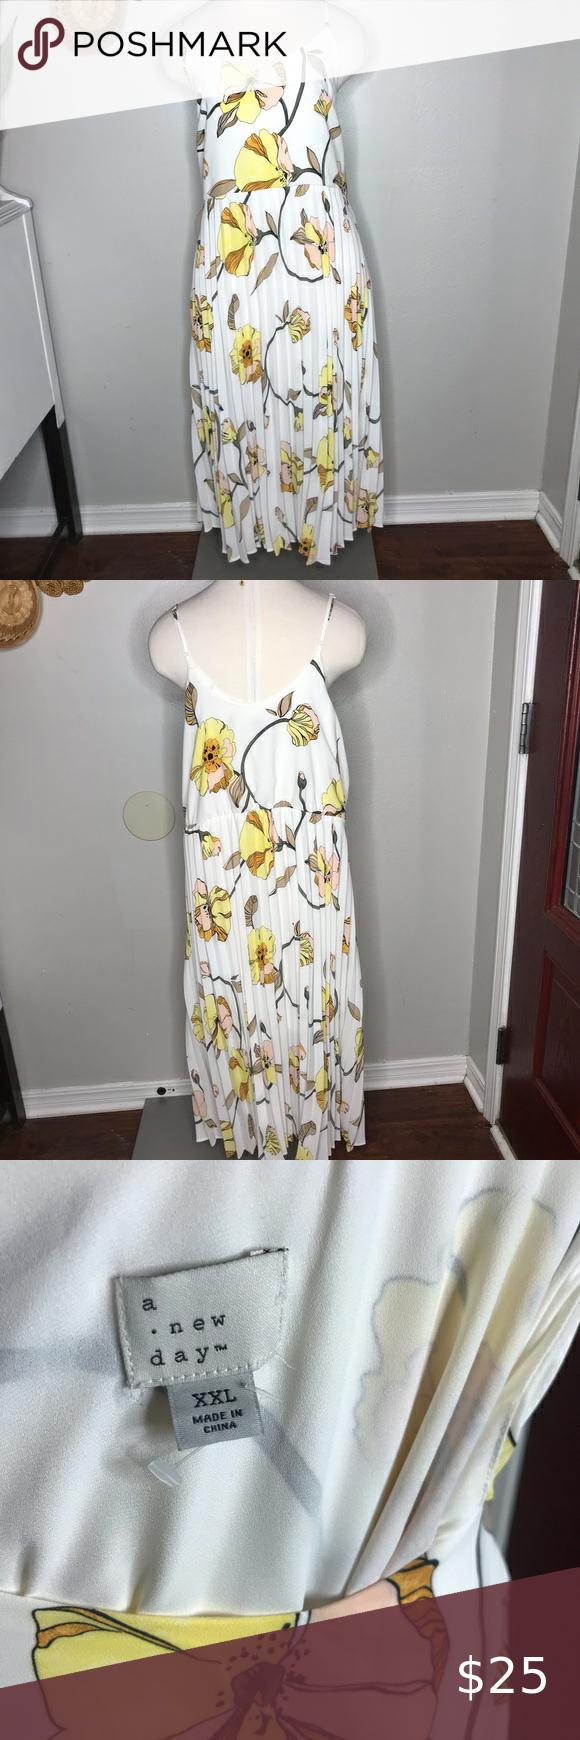 Target A New Day White Floral Midi Dress Xxl White Floral Midi Dress Floral Midi Dress Yellow Dress Summer [ 1740 x 580 Pixel ]